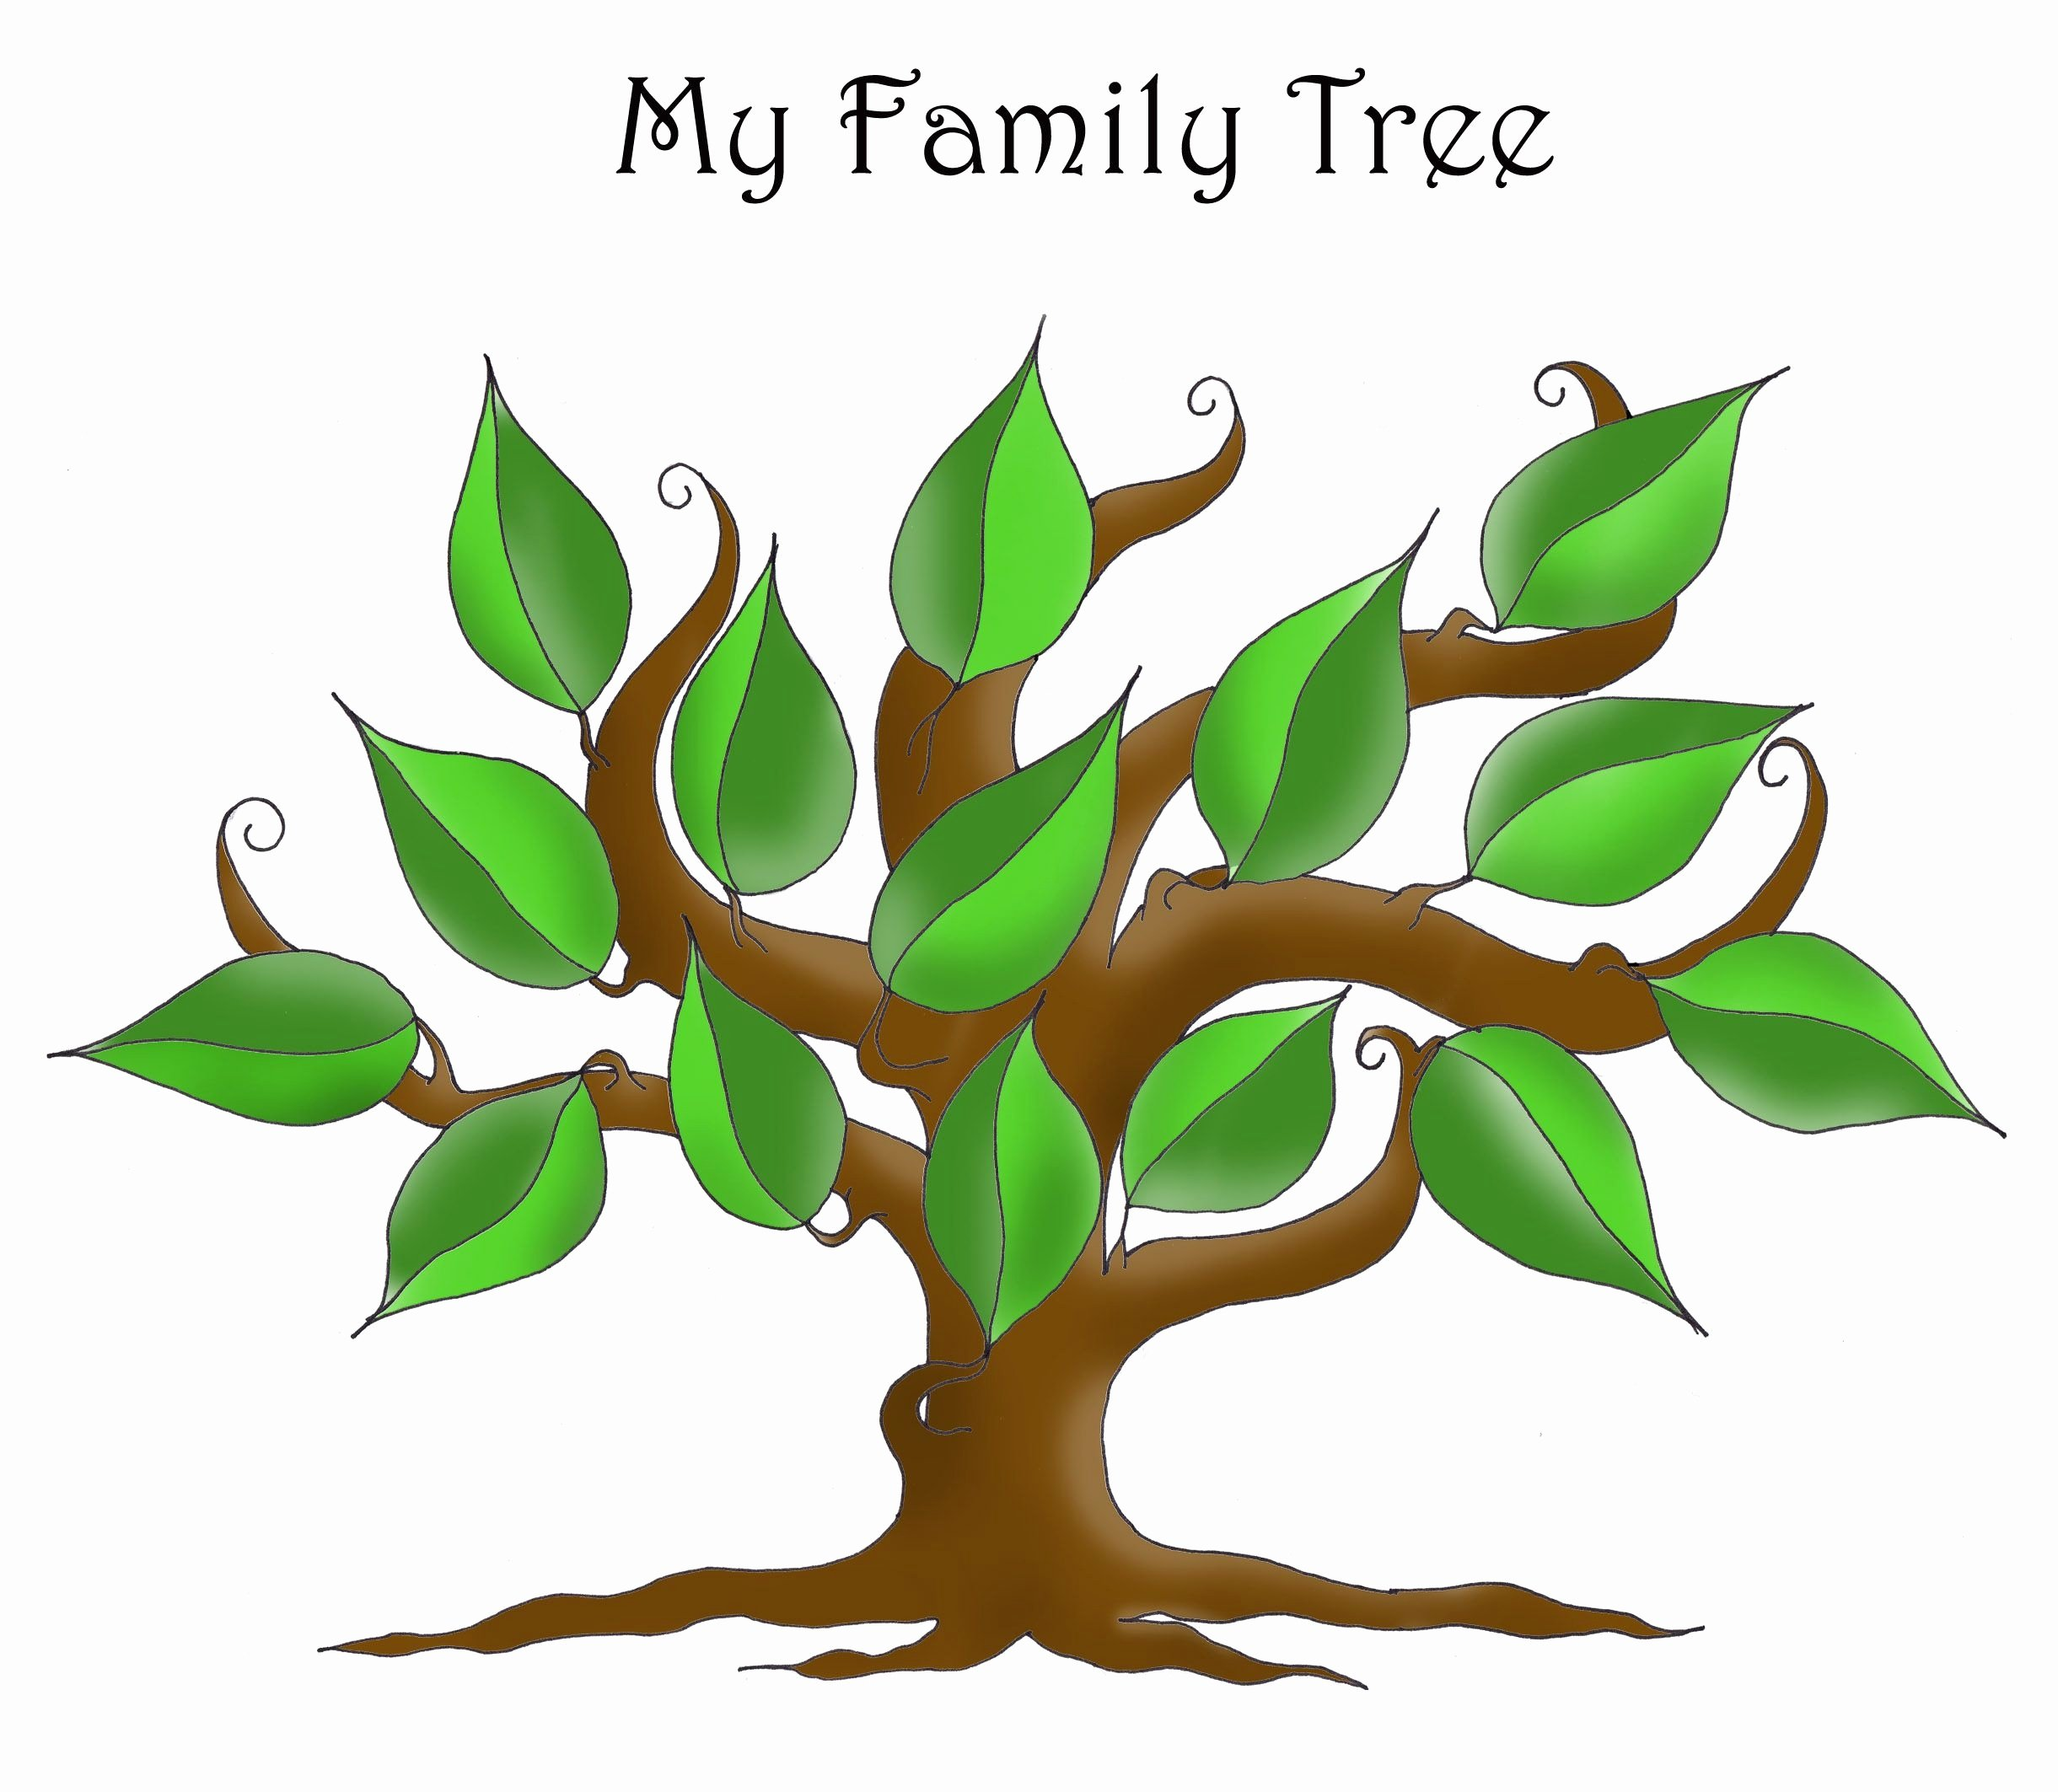 Free Editable Family Tree Templates Inspirational Free Editable Family Tree Template Daily Roabox